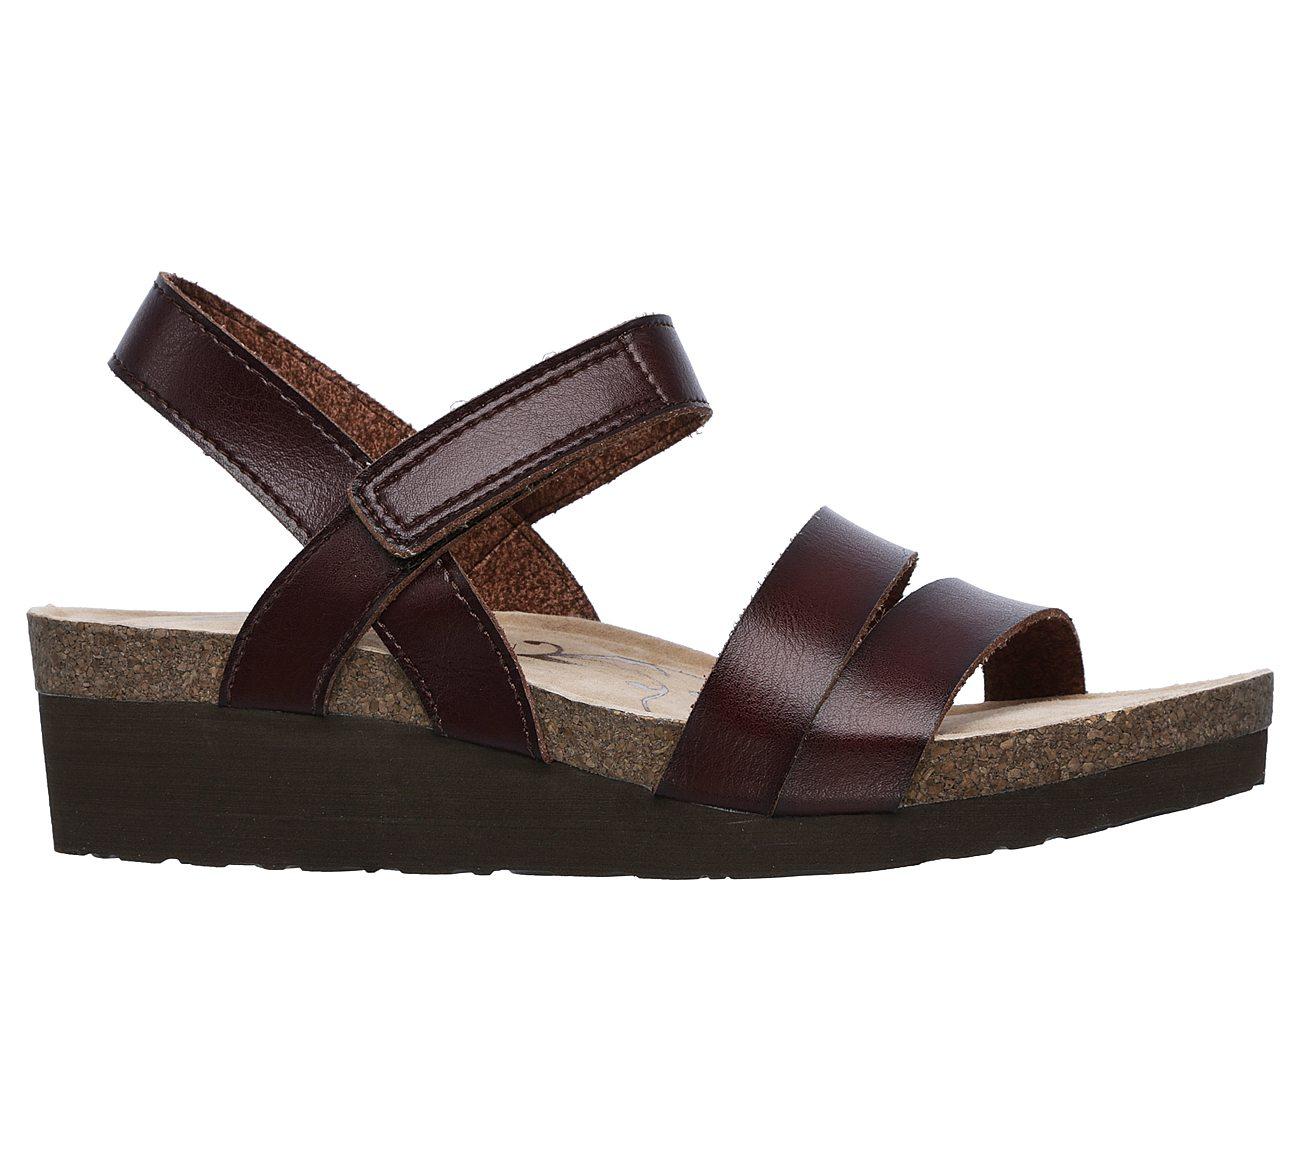 716c23e72ff3 Buy SKECHERS Troos - Simply Effortless SKECHERS Cali Shoes only £49.00